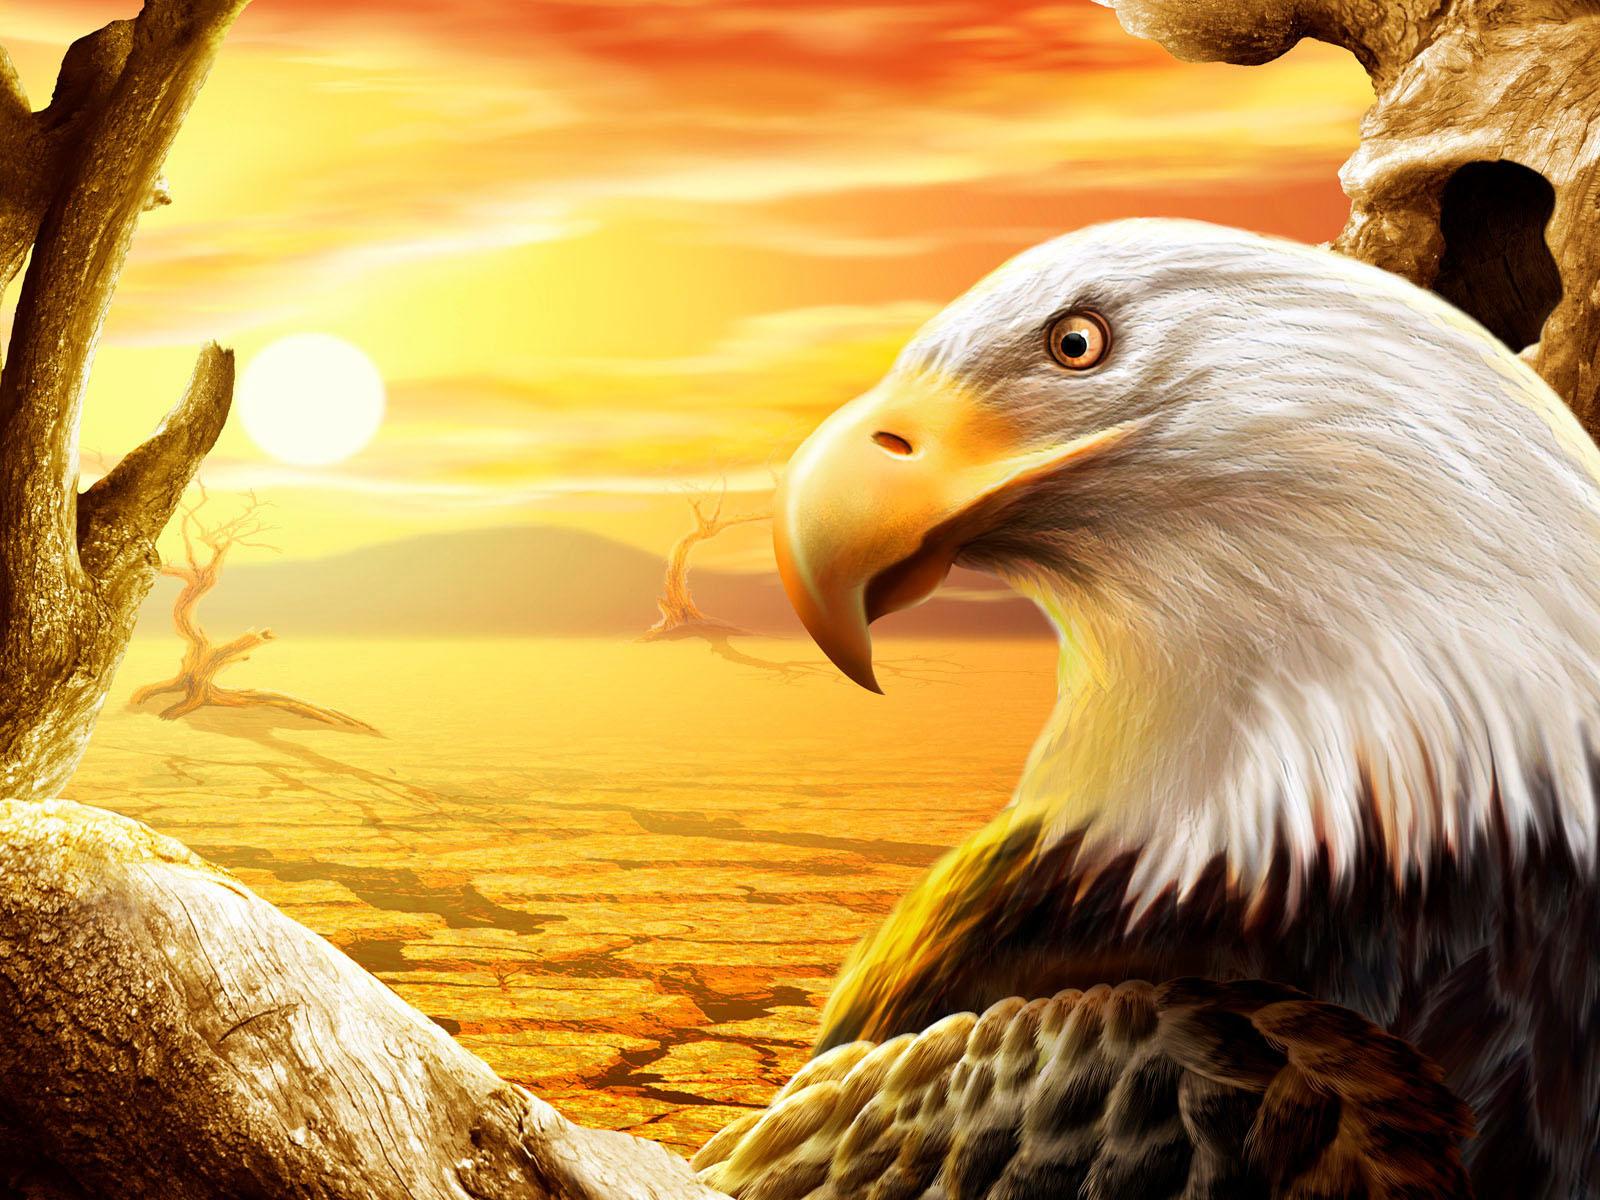 Eagle Wallpapers Desktop Wallpapers 1600x1200